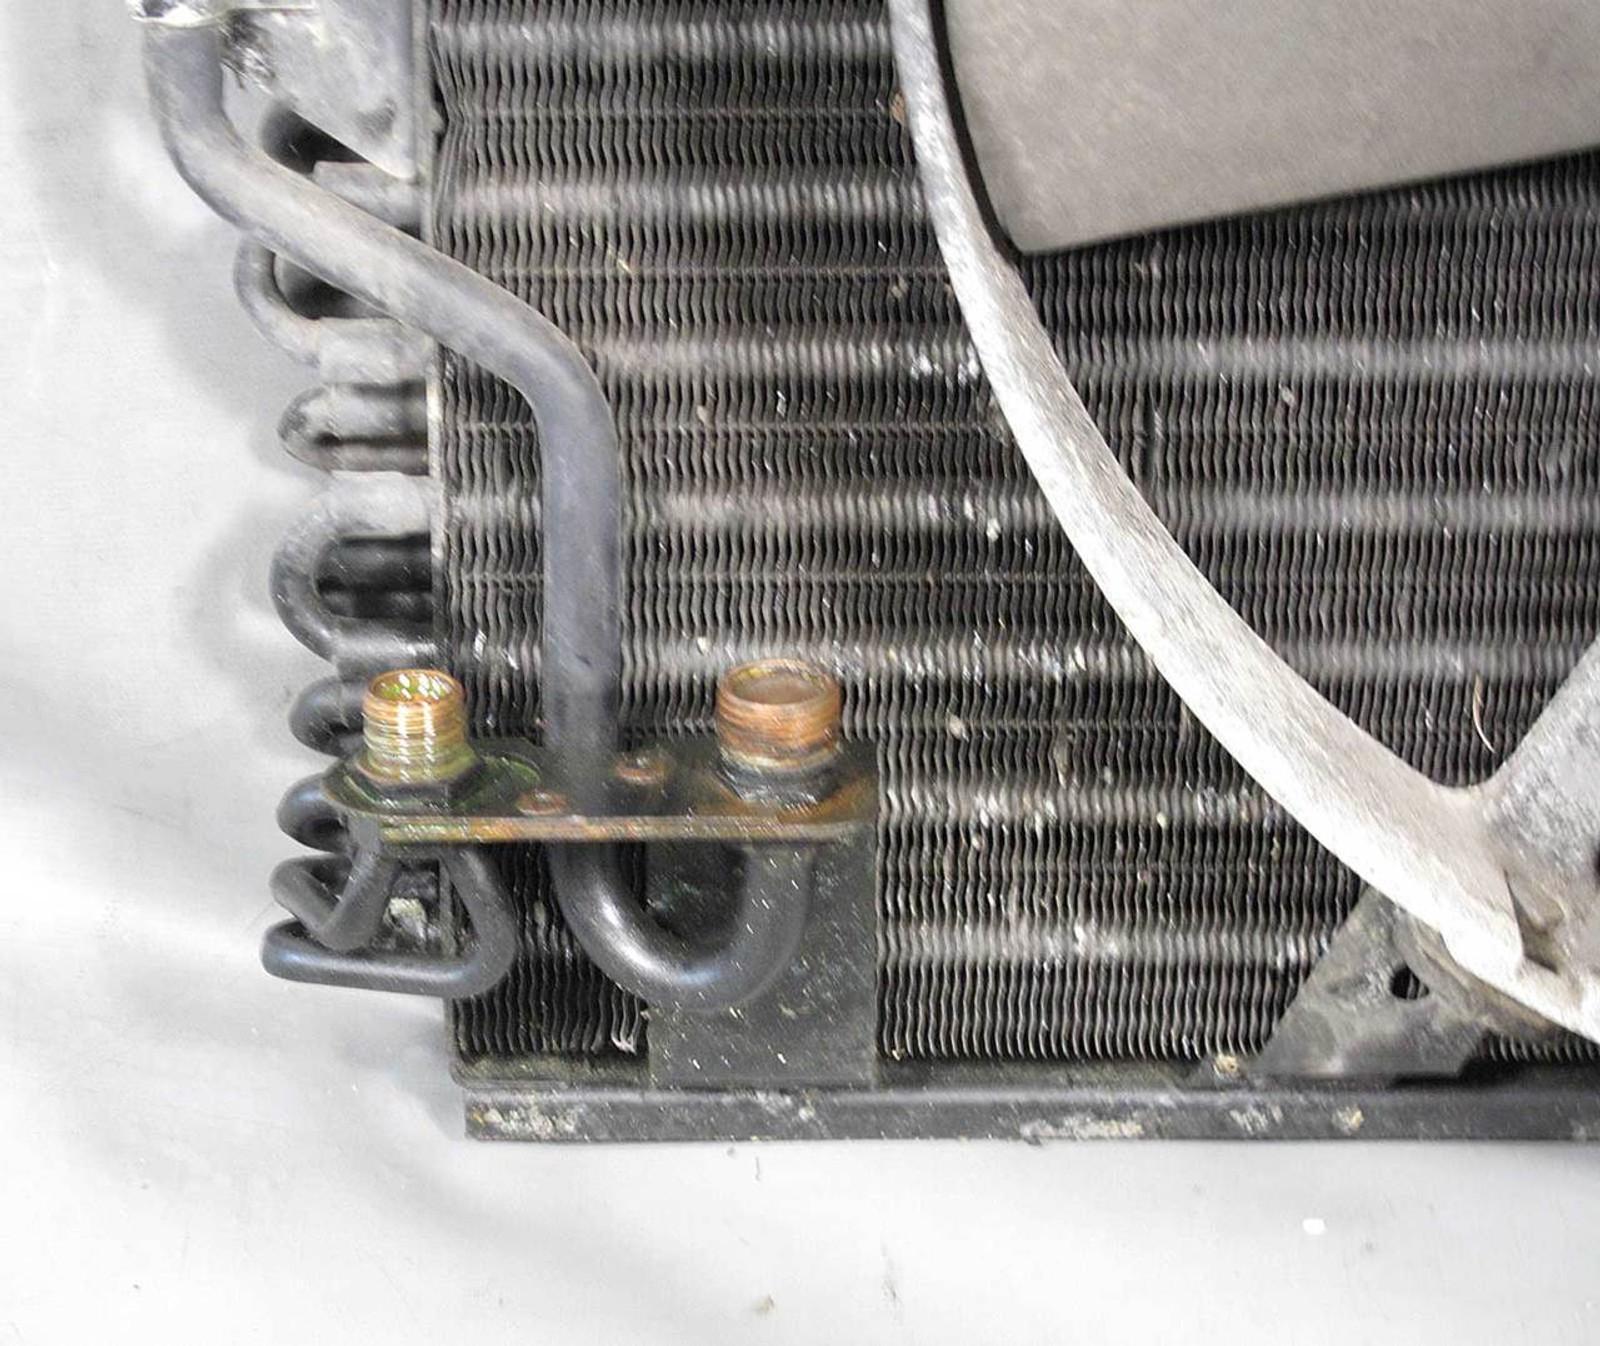 Pusher Ac Fan Wiring Diagrams Dsm Bmw E34 5 Series E32 Condenser Radiator W Auxiliary Electric Gm